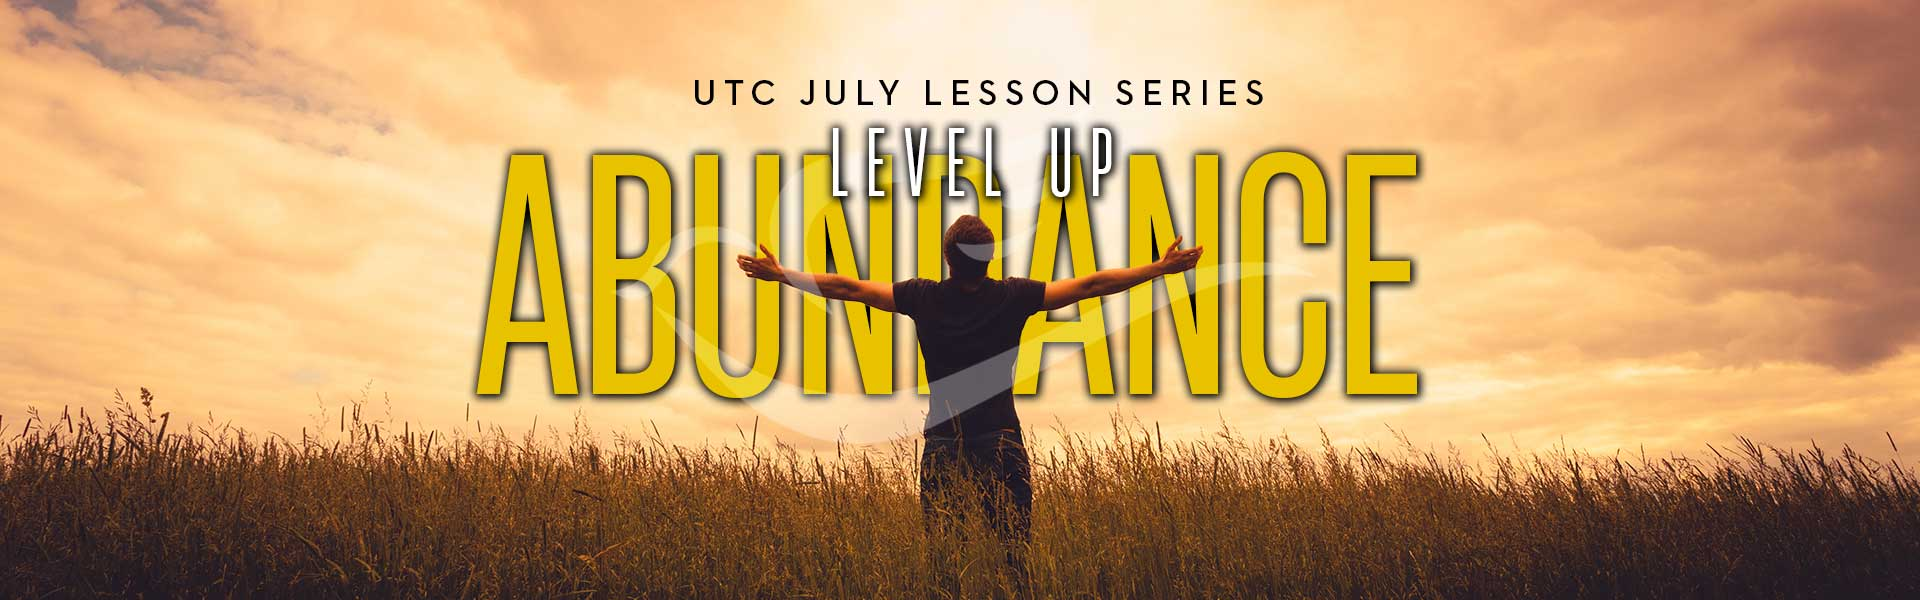 July 2021 Lesson Banner